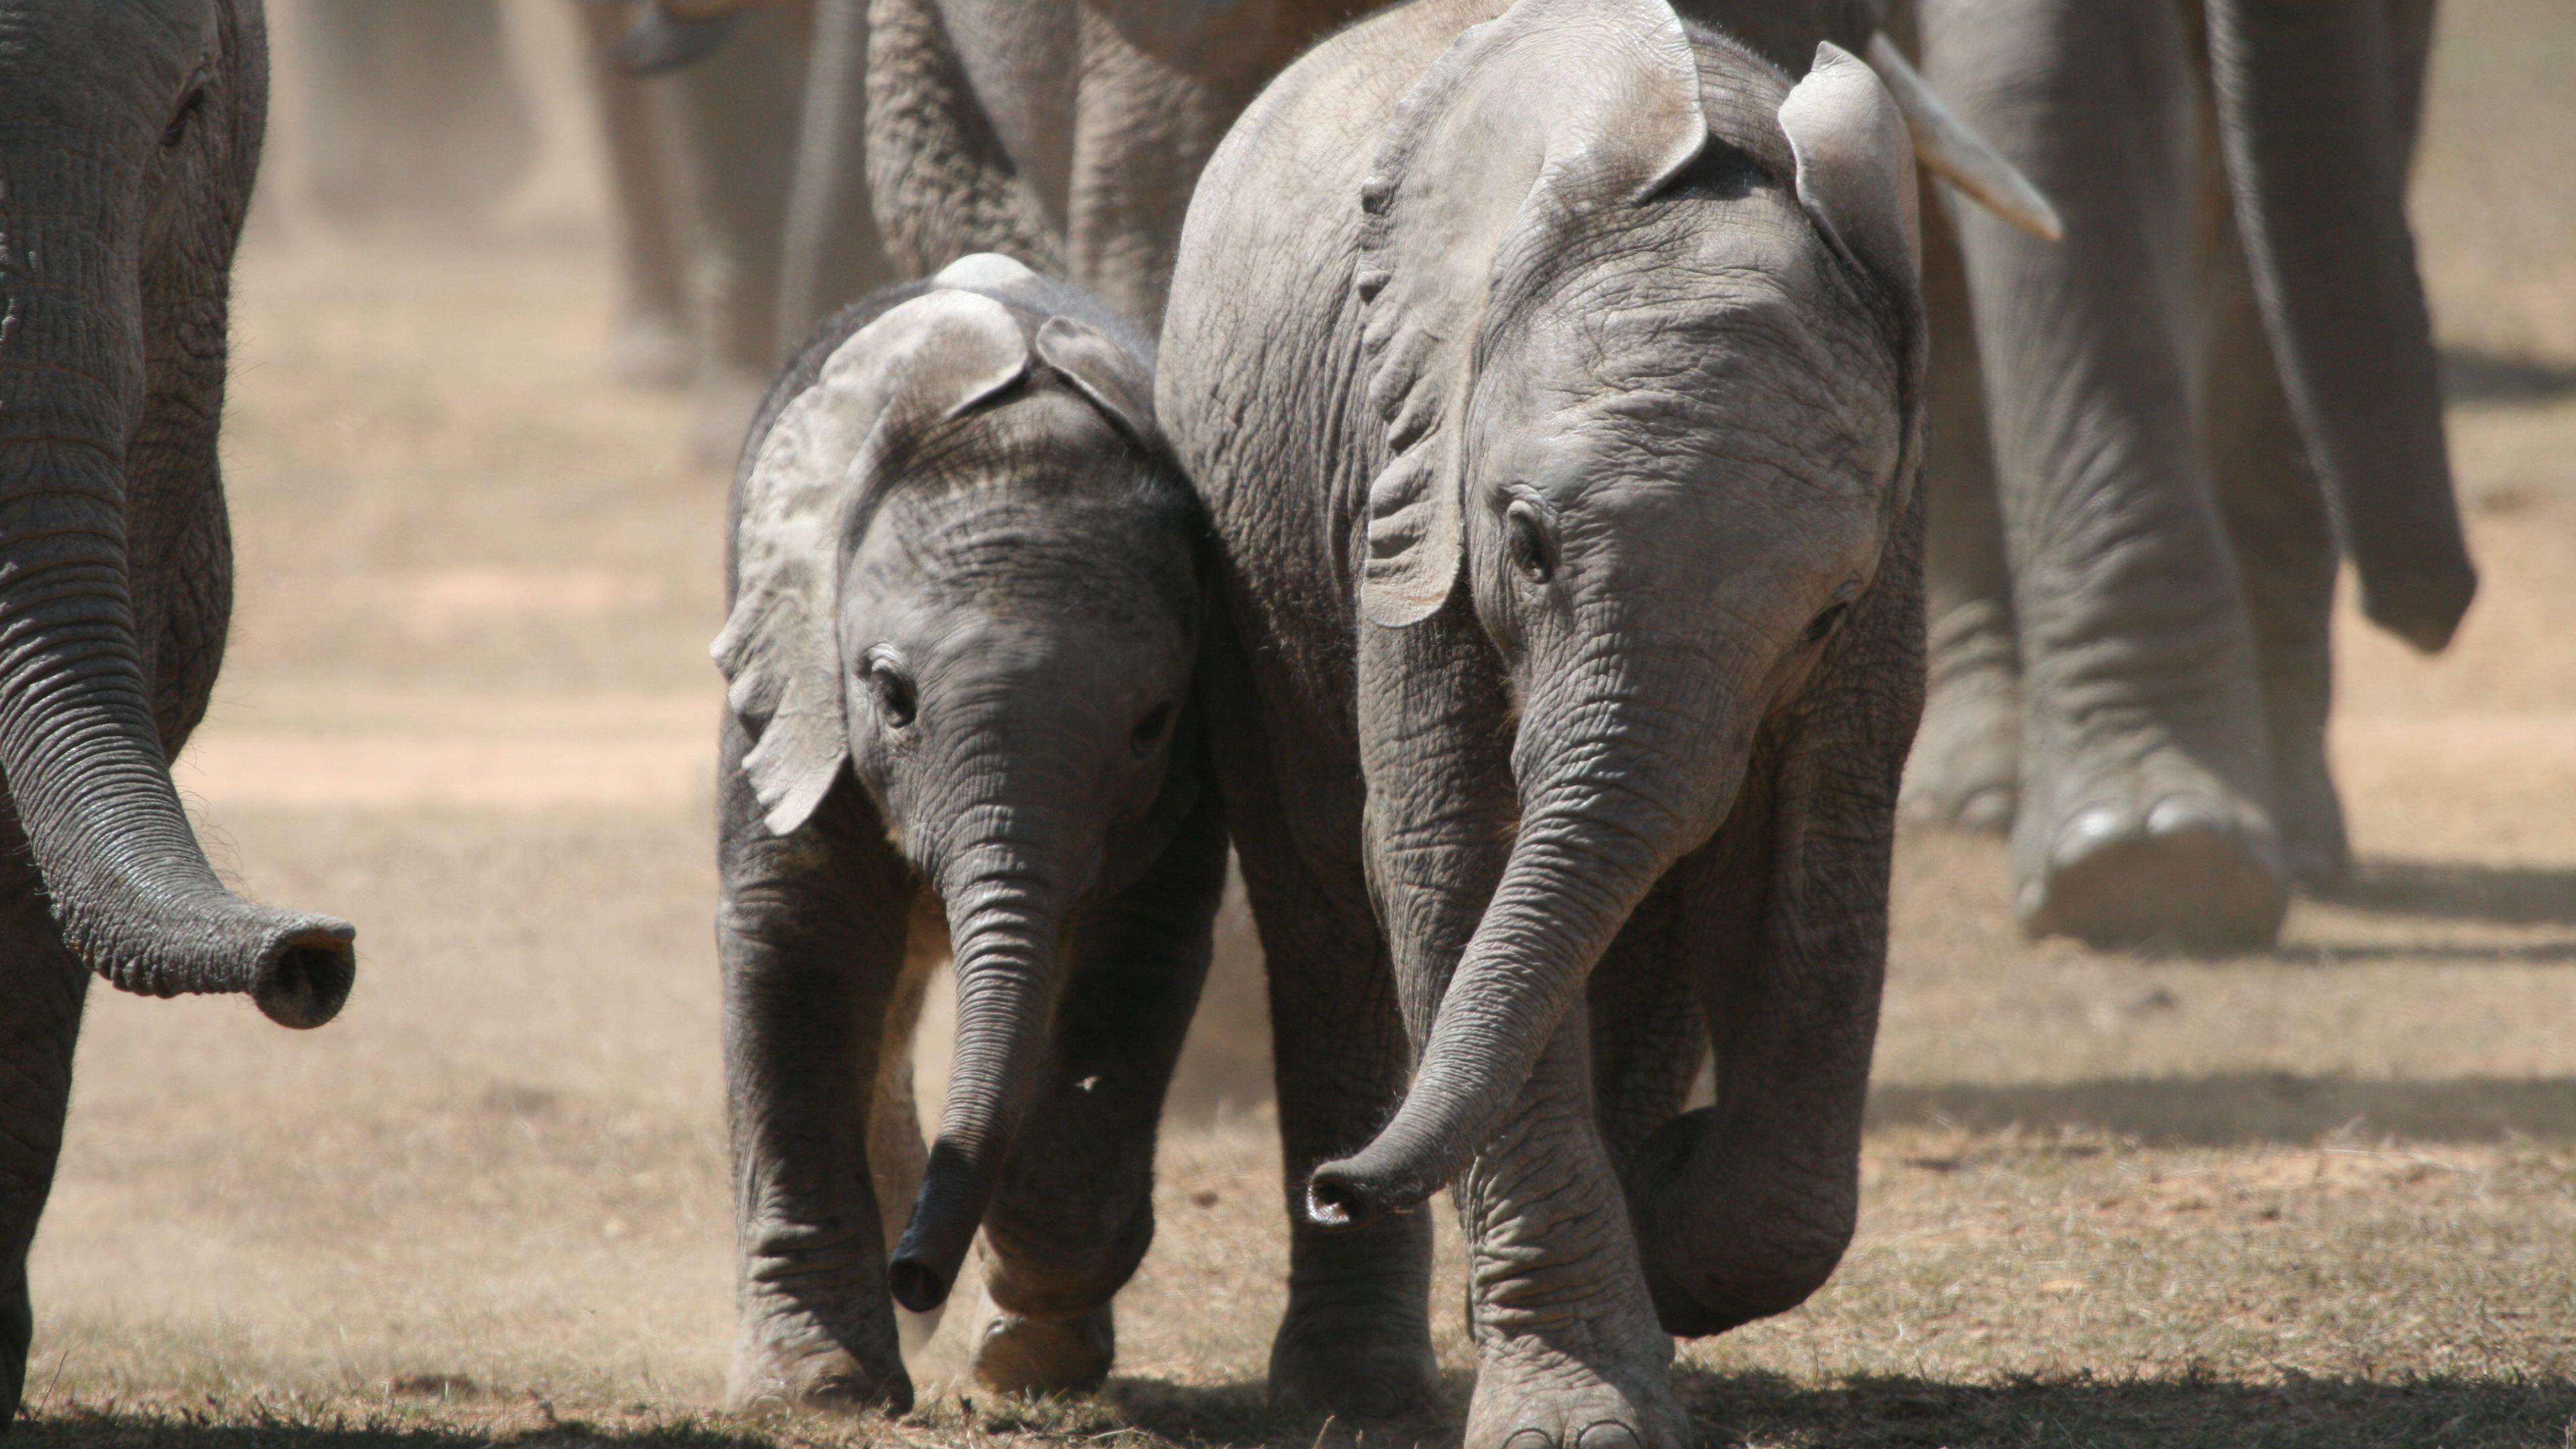 best friends - elephant cubs | hd wallpapers · 4k